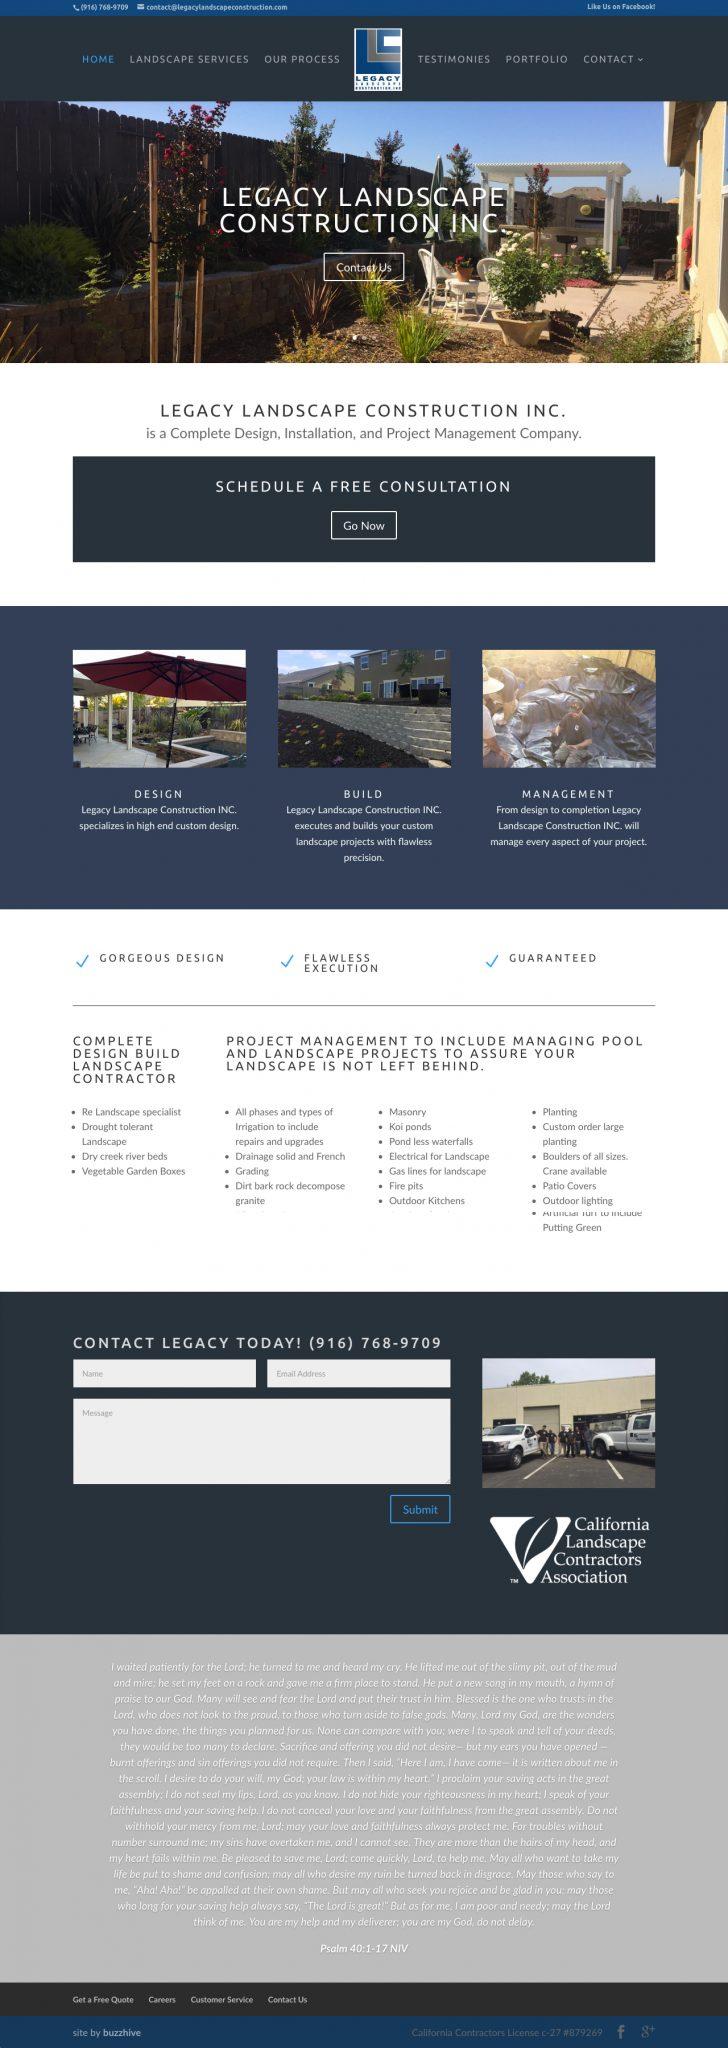 LegacyLandscapeConstruction.com_ Standalone Pricing